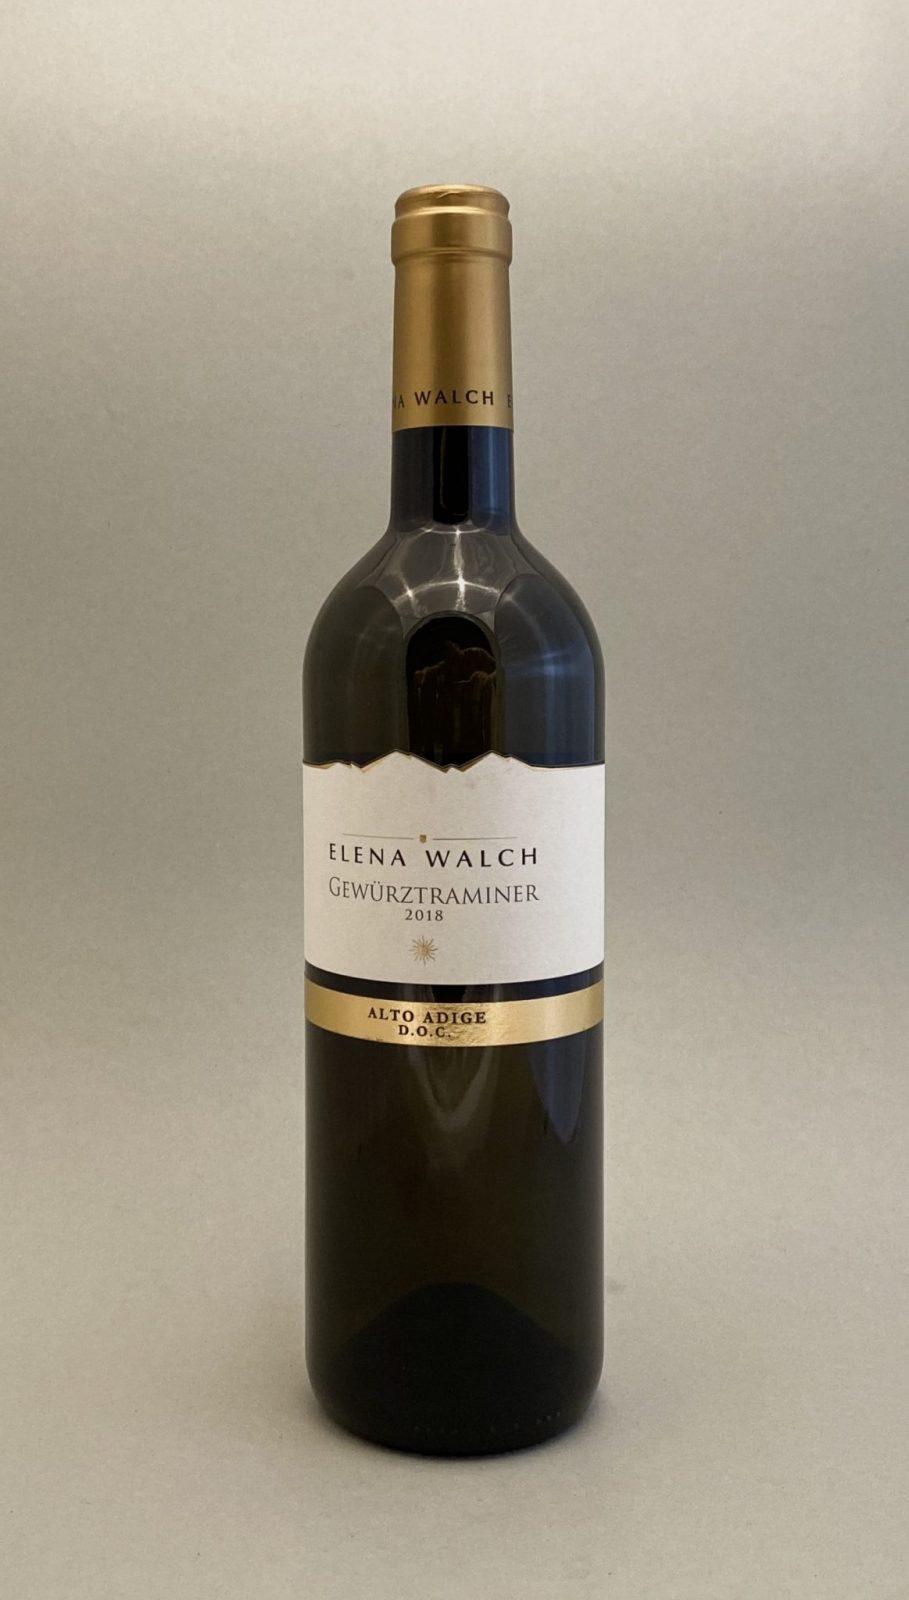 ELENA WALCH Gewürtztraminer 2018, vinoteka Sunny wines slnecnice mesto, Bratislava petrzalka, vino biele z Talianska